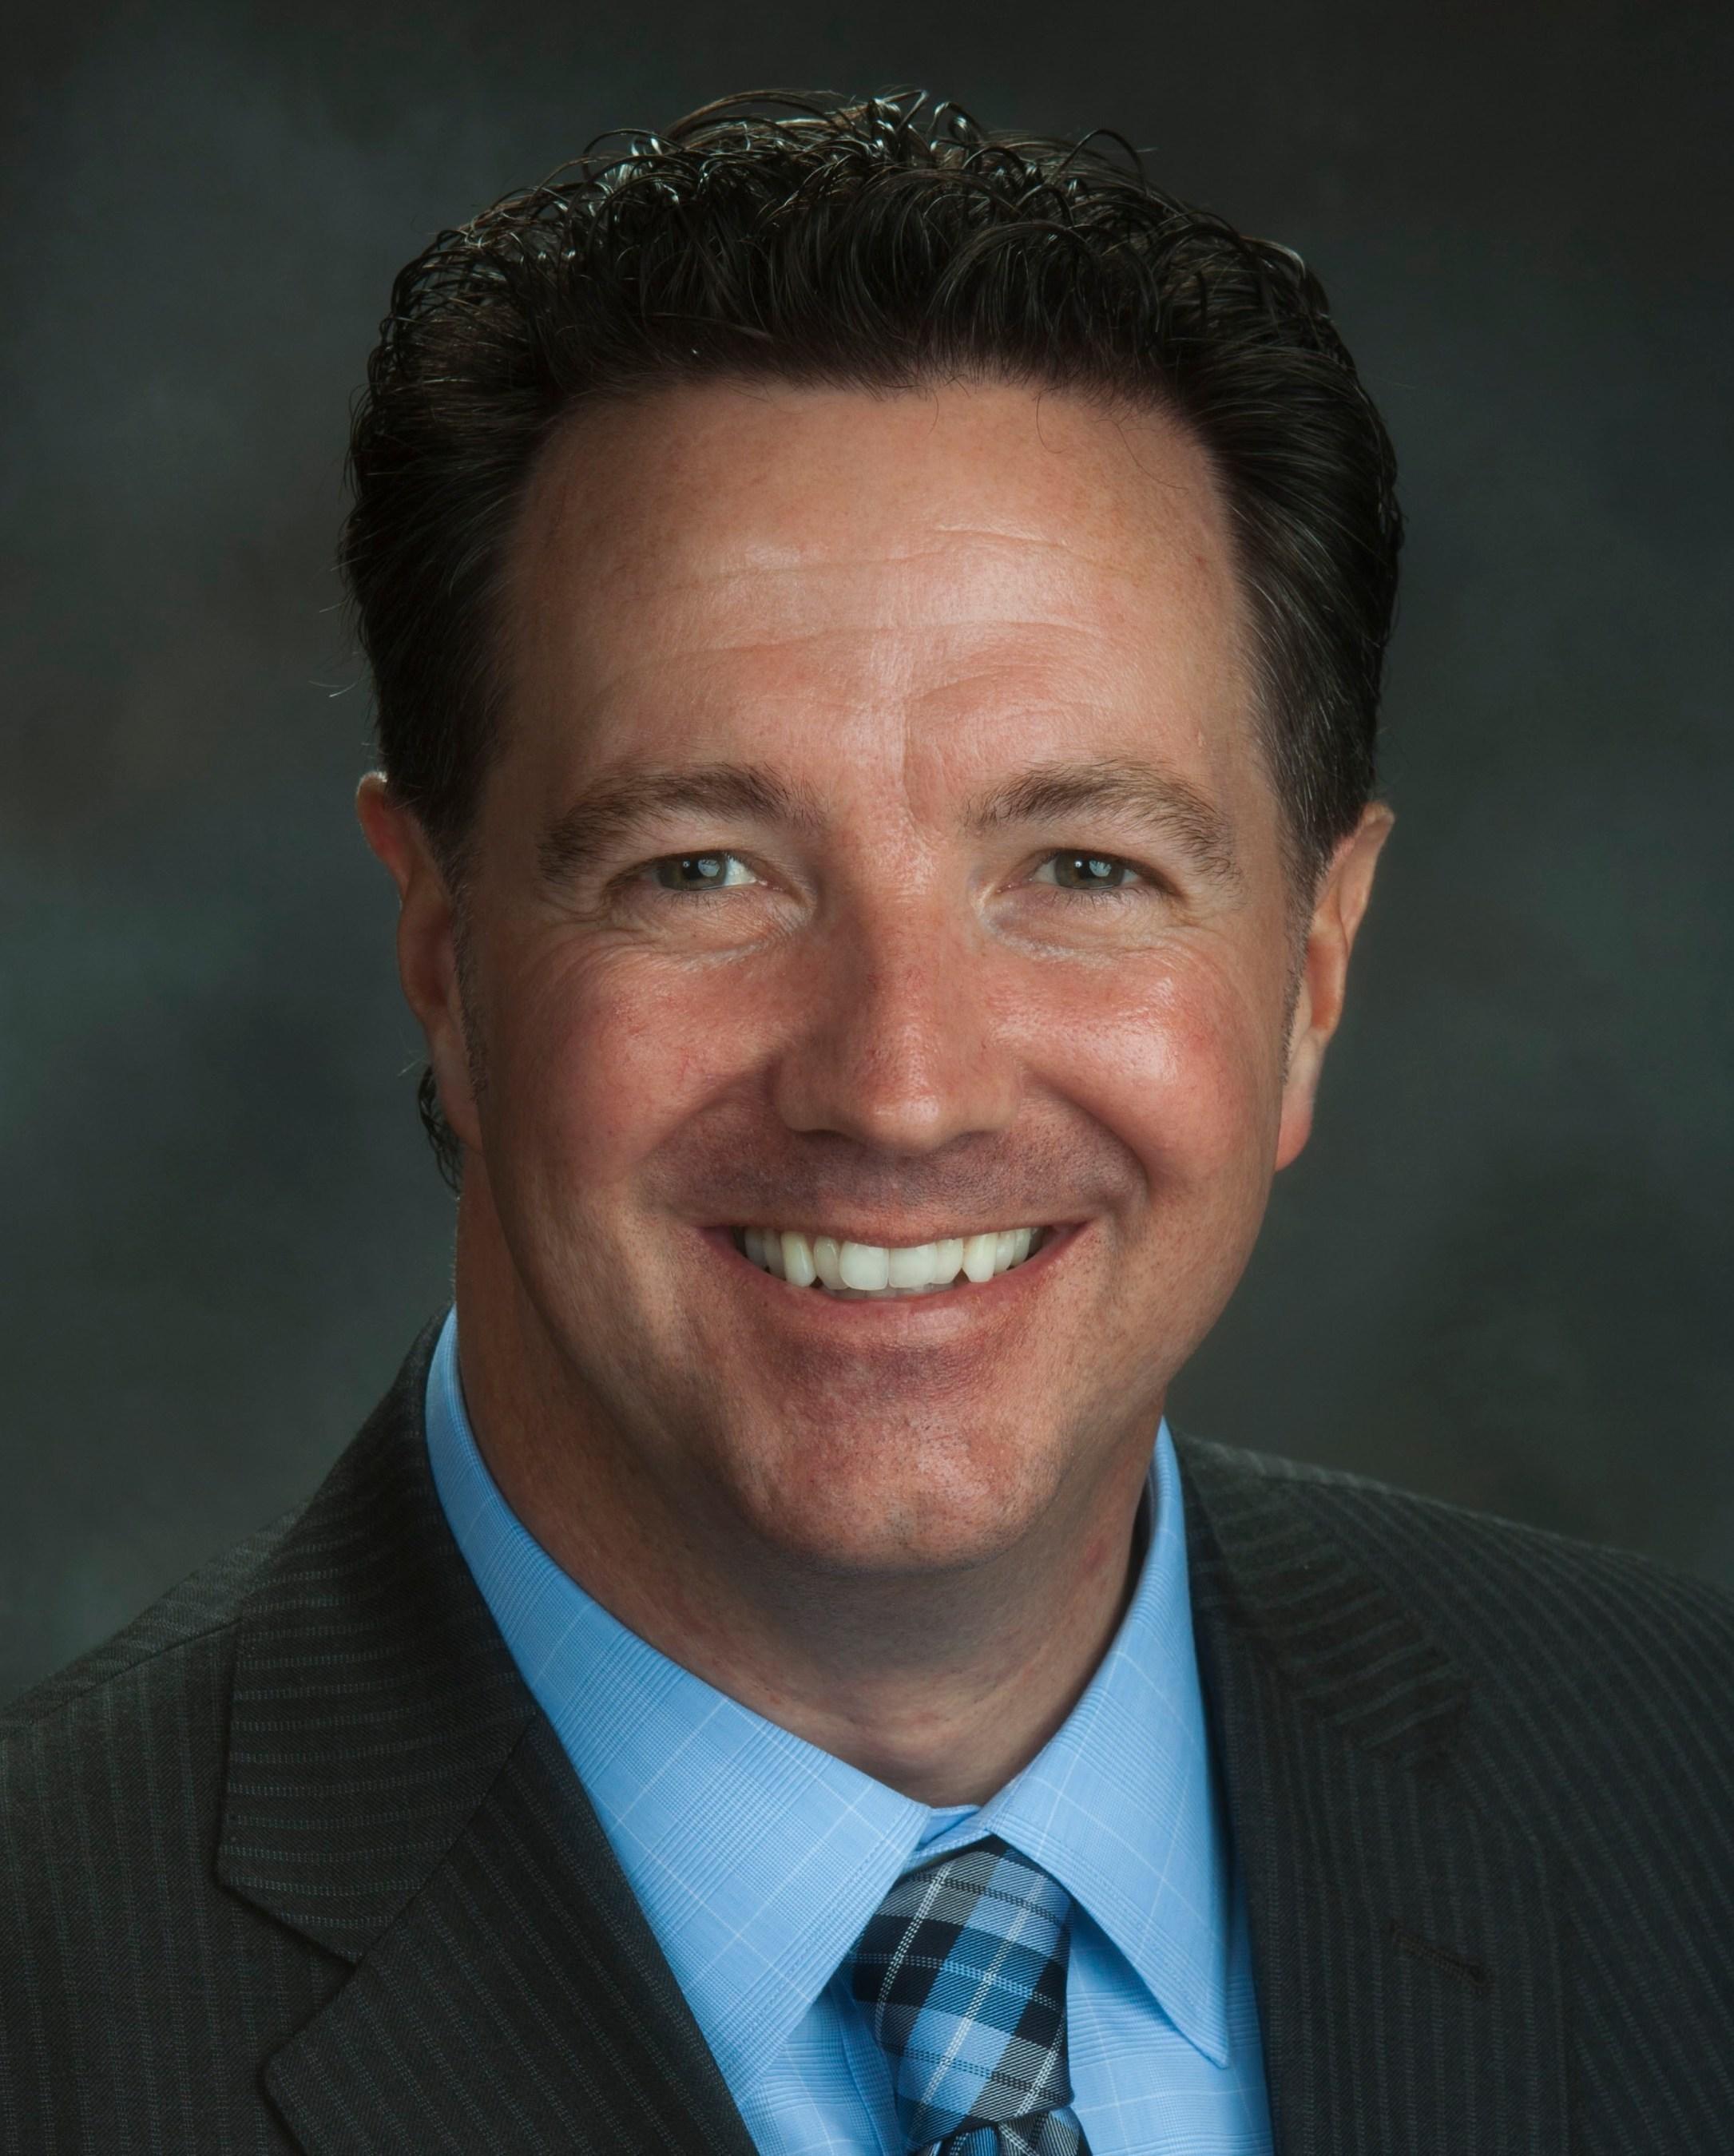 Mark O'Brien, Vice President of Brand Marketing and Management, Mizuno USA